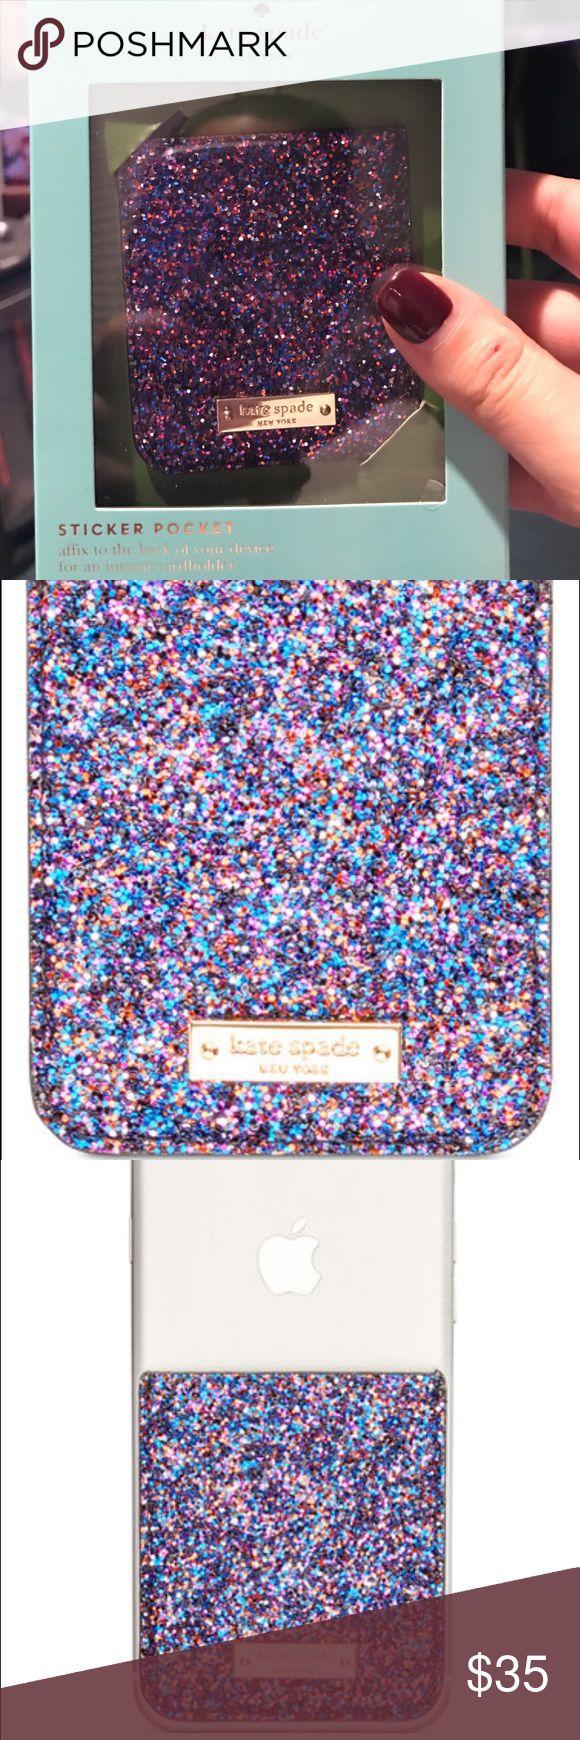 NWT Kate Spade glitter phone card pocket Fun phone accessory that creates a pocket to hold your id or credit card kate spade Accessories Phone Cases